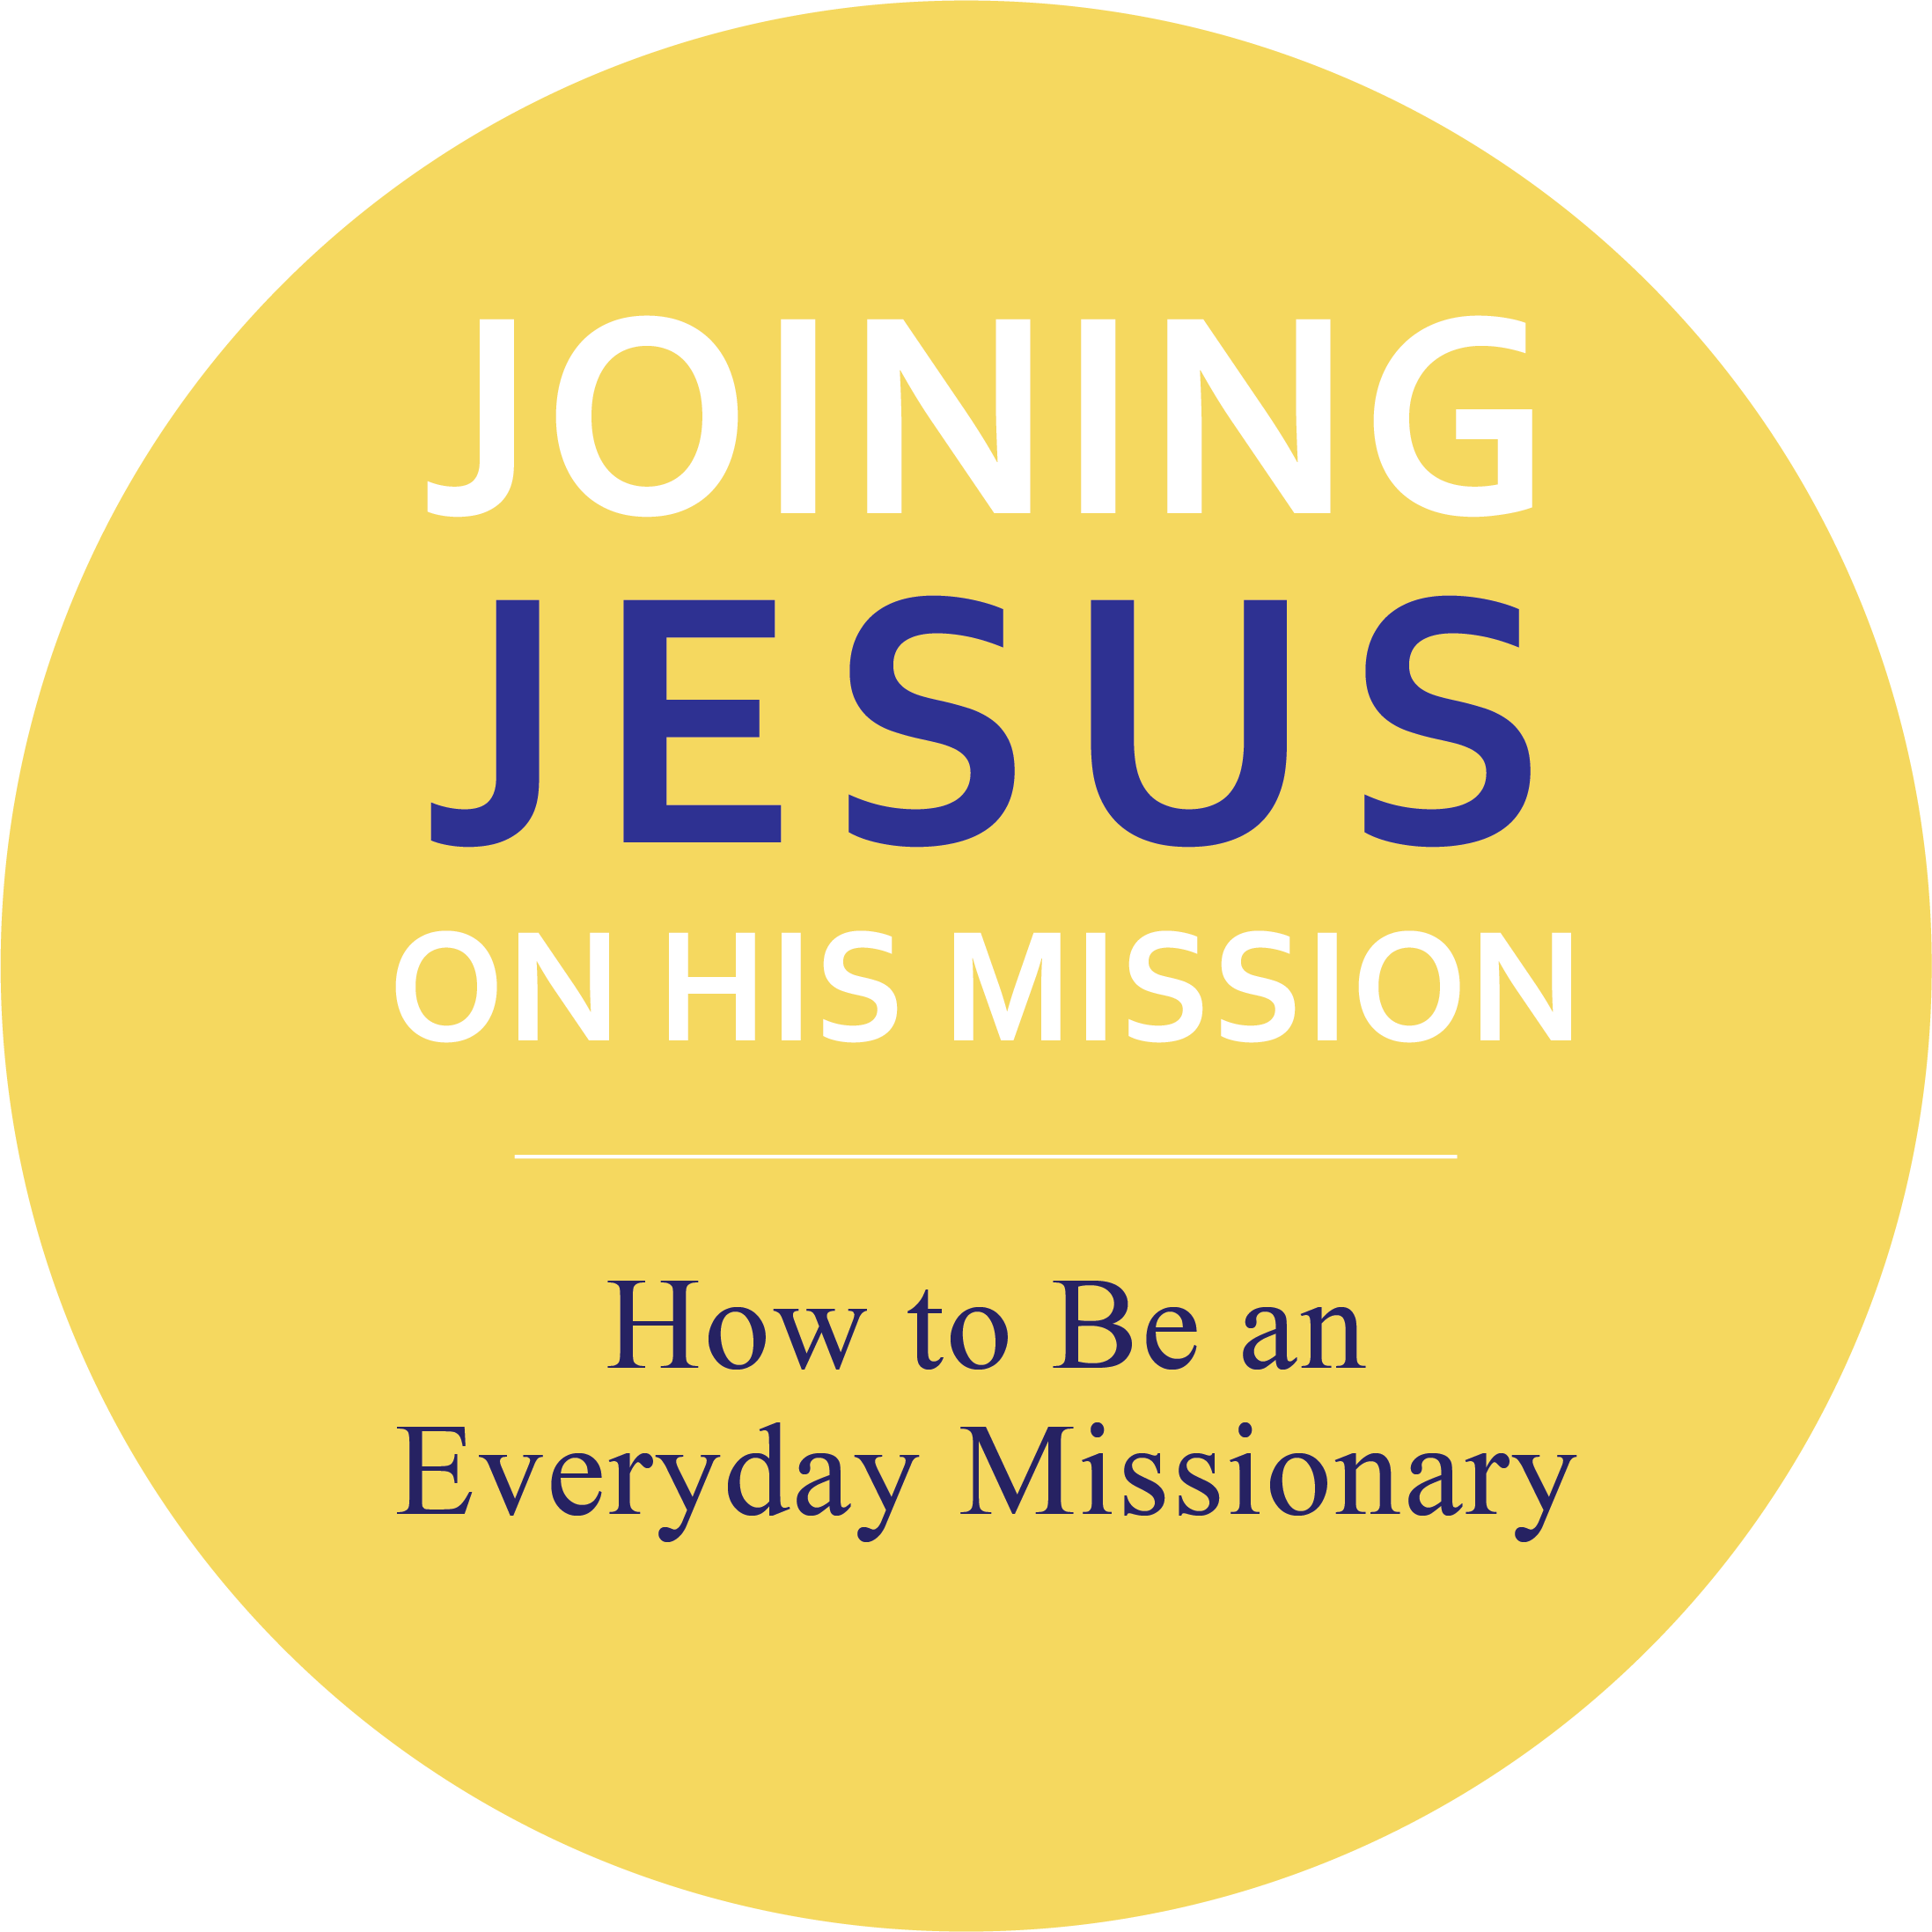 Joining Jesus